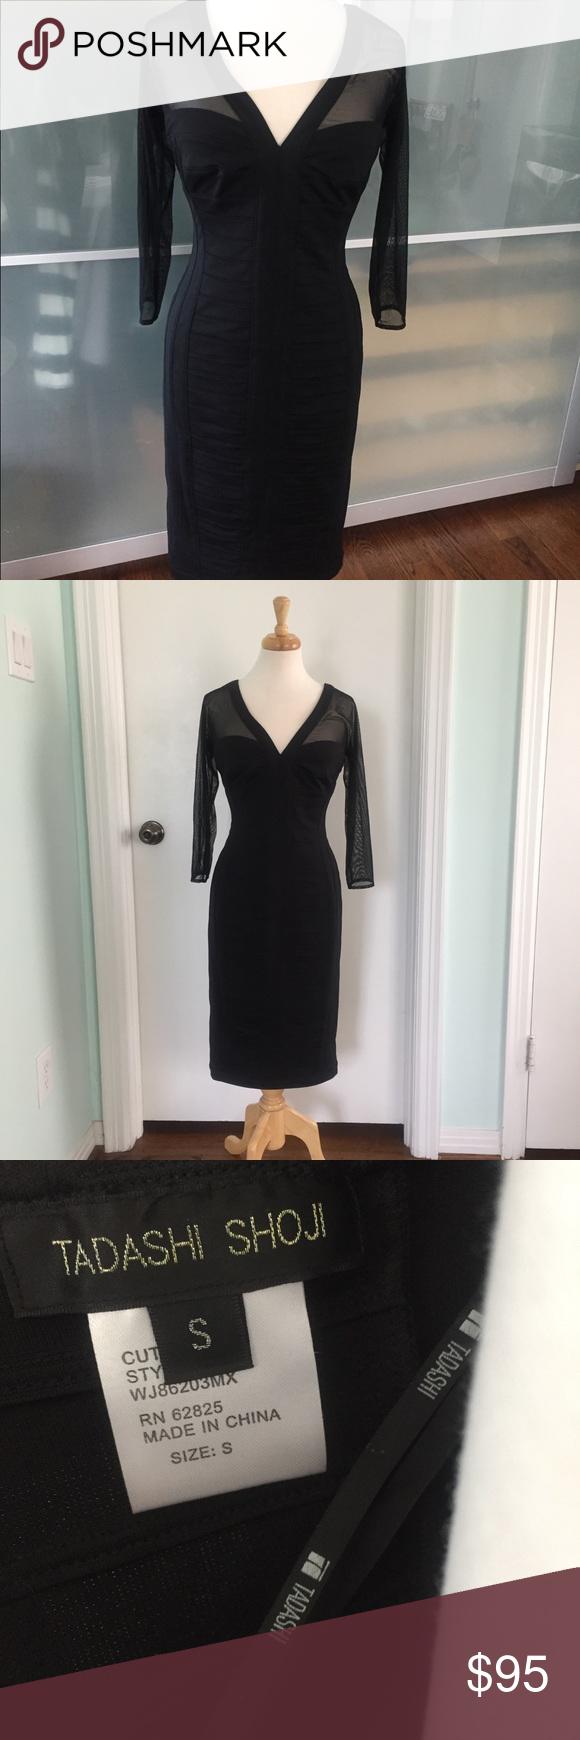 Tadashi Shoji Black Dress With Shear Sleeves Tadashi Shoji Black Dress Black Dress Dresses [ 1740 x 580 Pixel ]